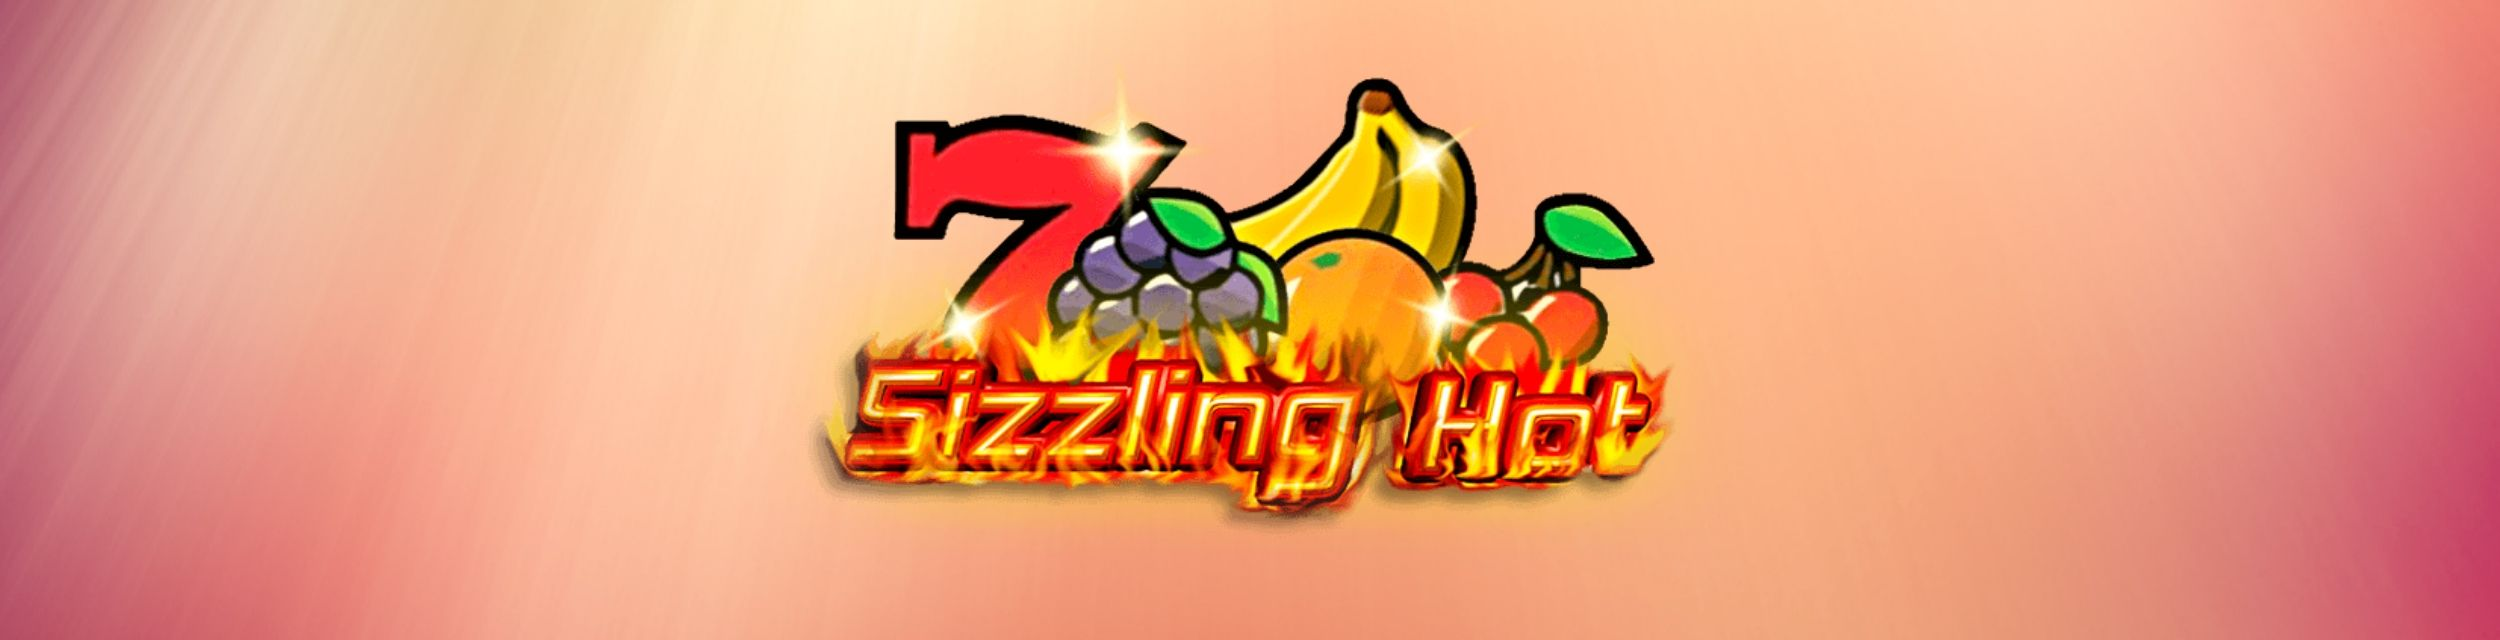 Sizzling Hot App Download